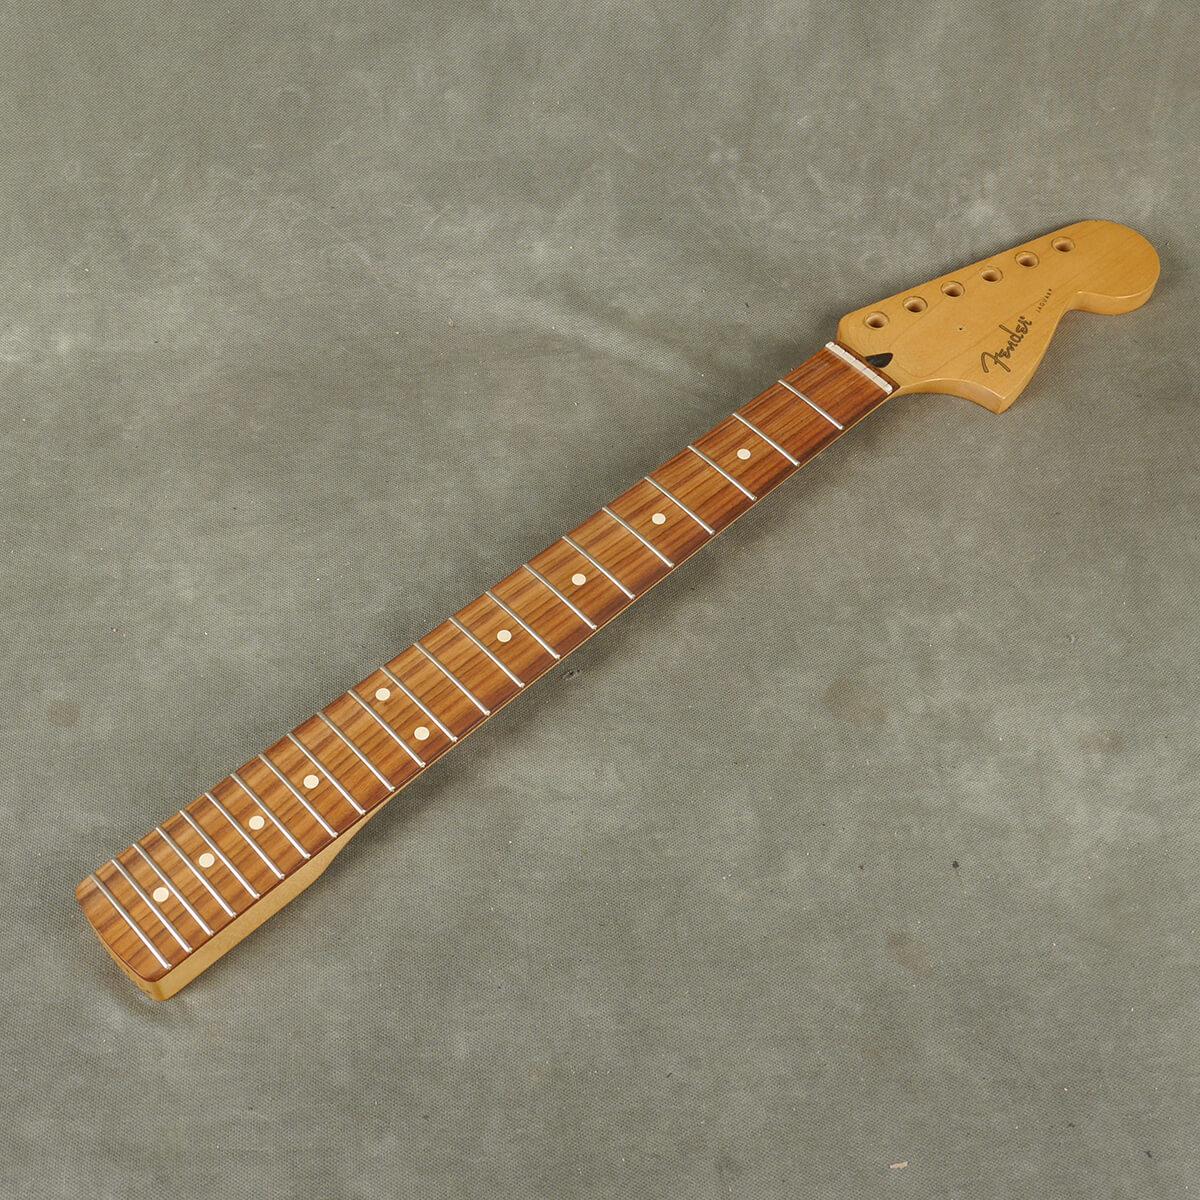 Fender Jaguar Neck - Pau Ferro - 2nd Hand